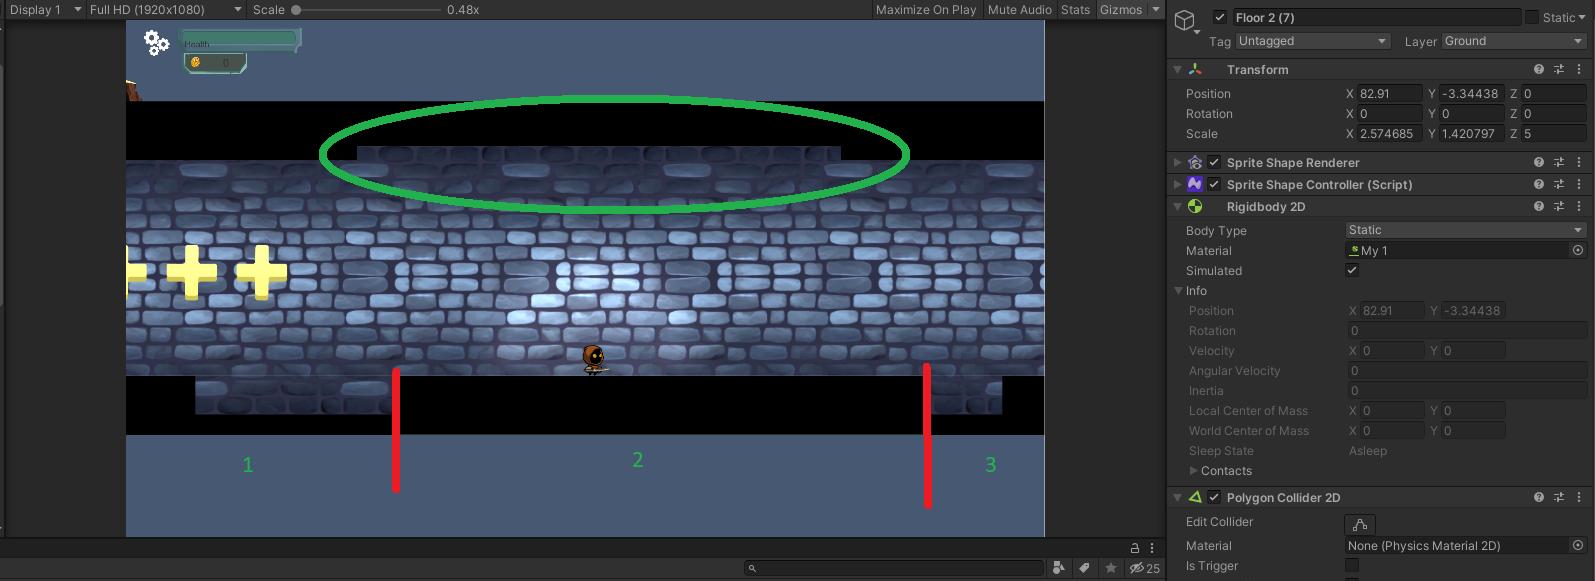 60363bd24a1d2078036559 | Как решить проблему с камерой (Perspective) в 2Д проекте на Unity?